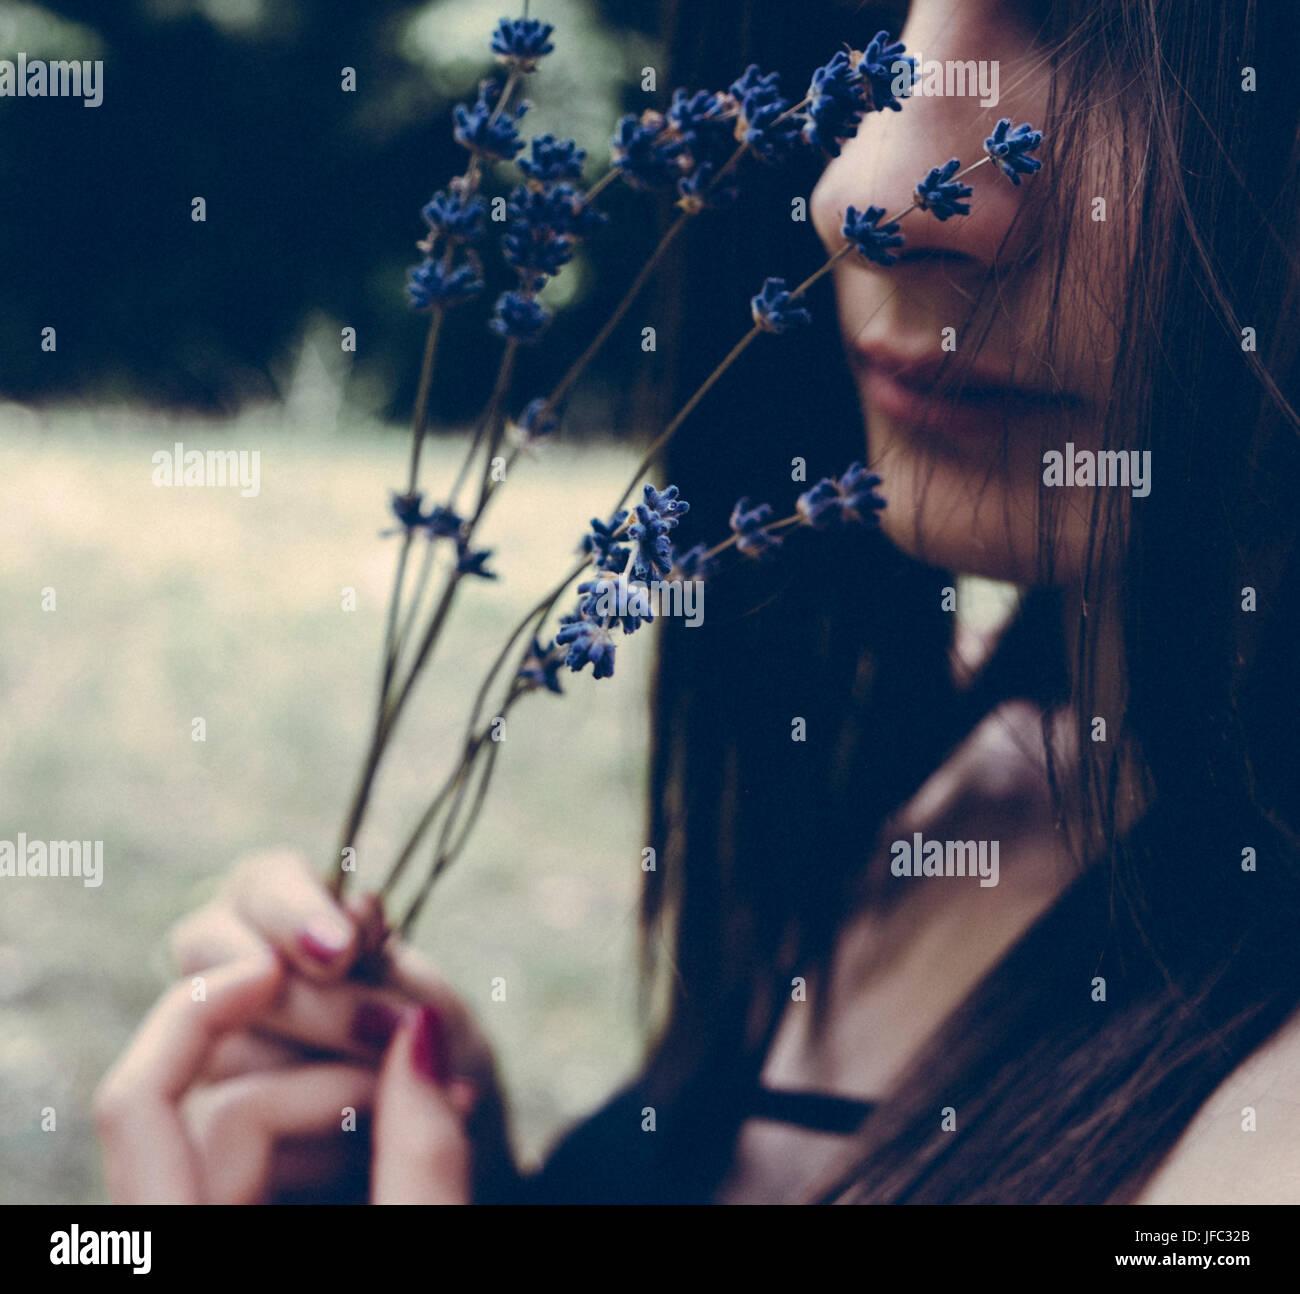 Creative artistic film photo of beautiful woman - Stock Image